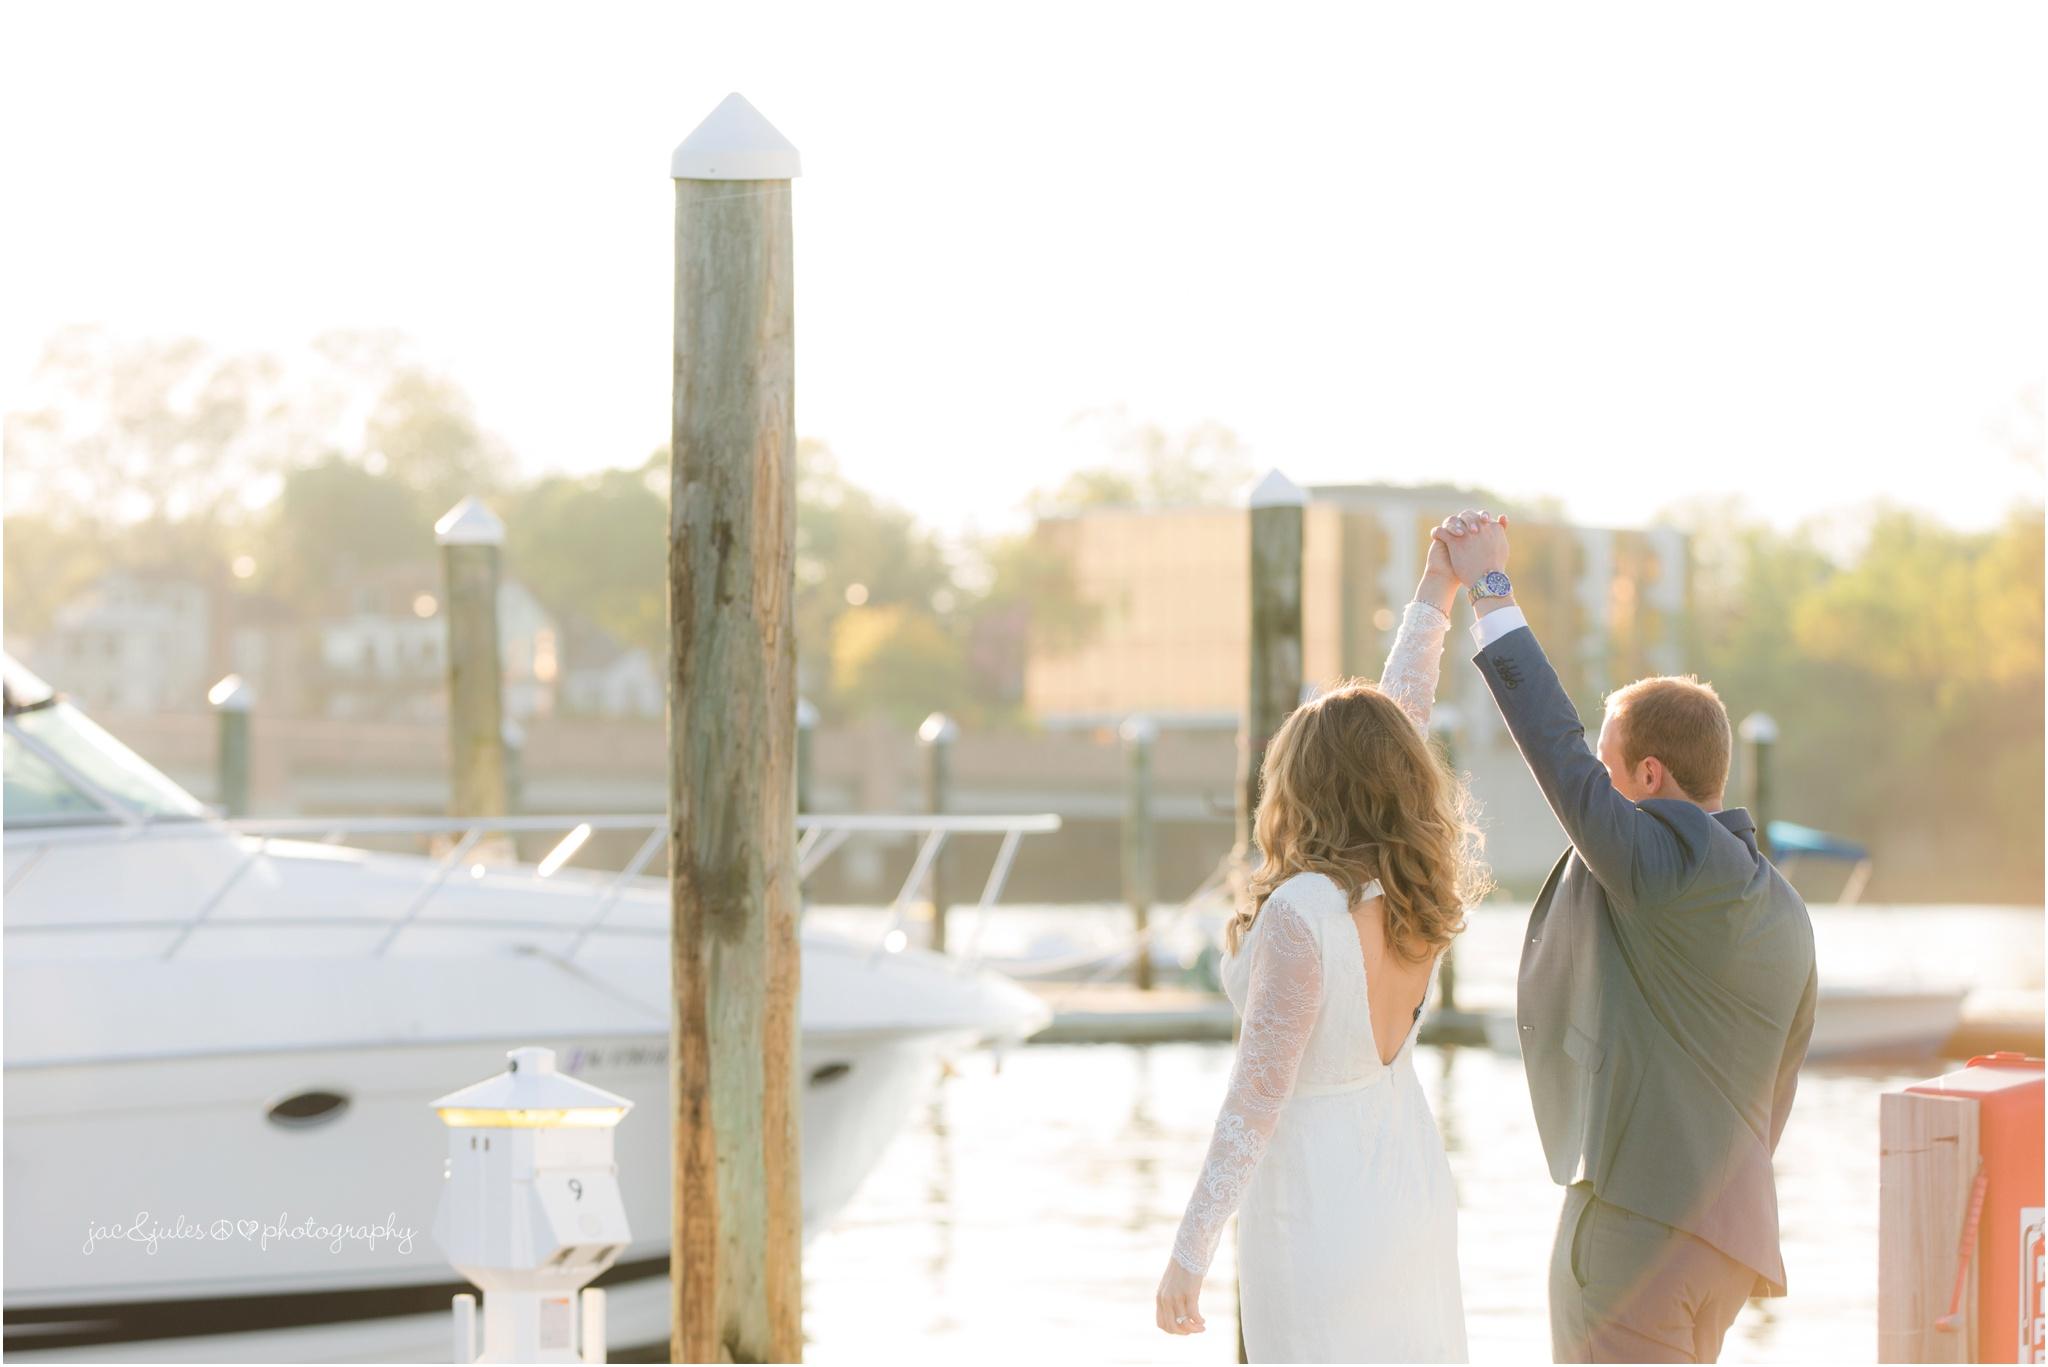 bride and groom photo at marina in redbank, nj